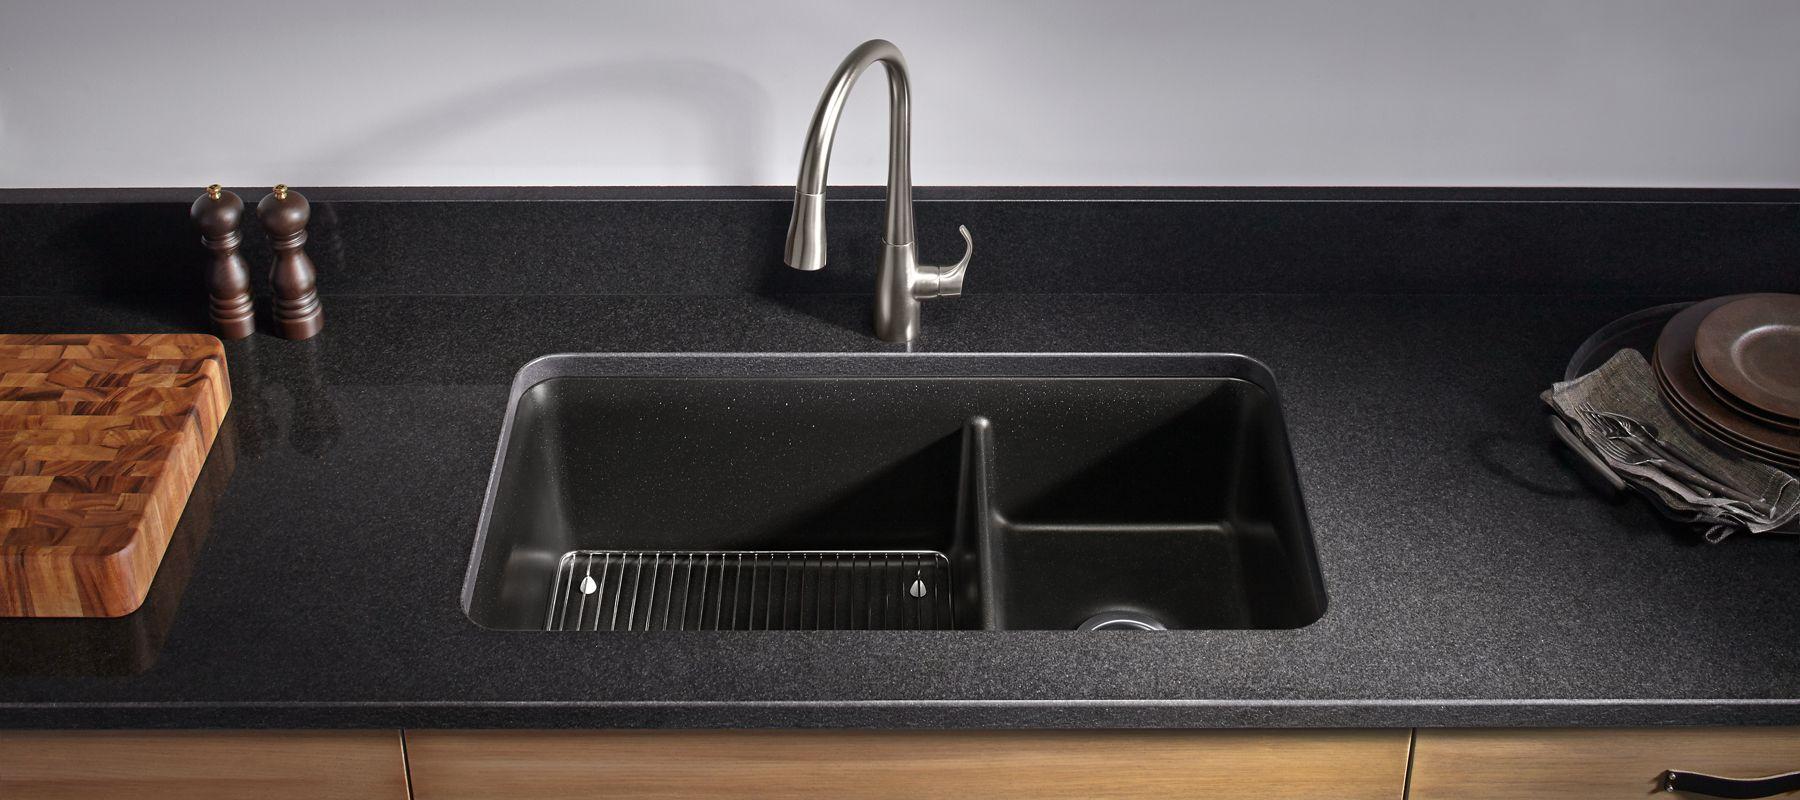 Introducing Kohler S Neoroc Sinks Consolidated Plumbing Blog